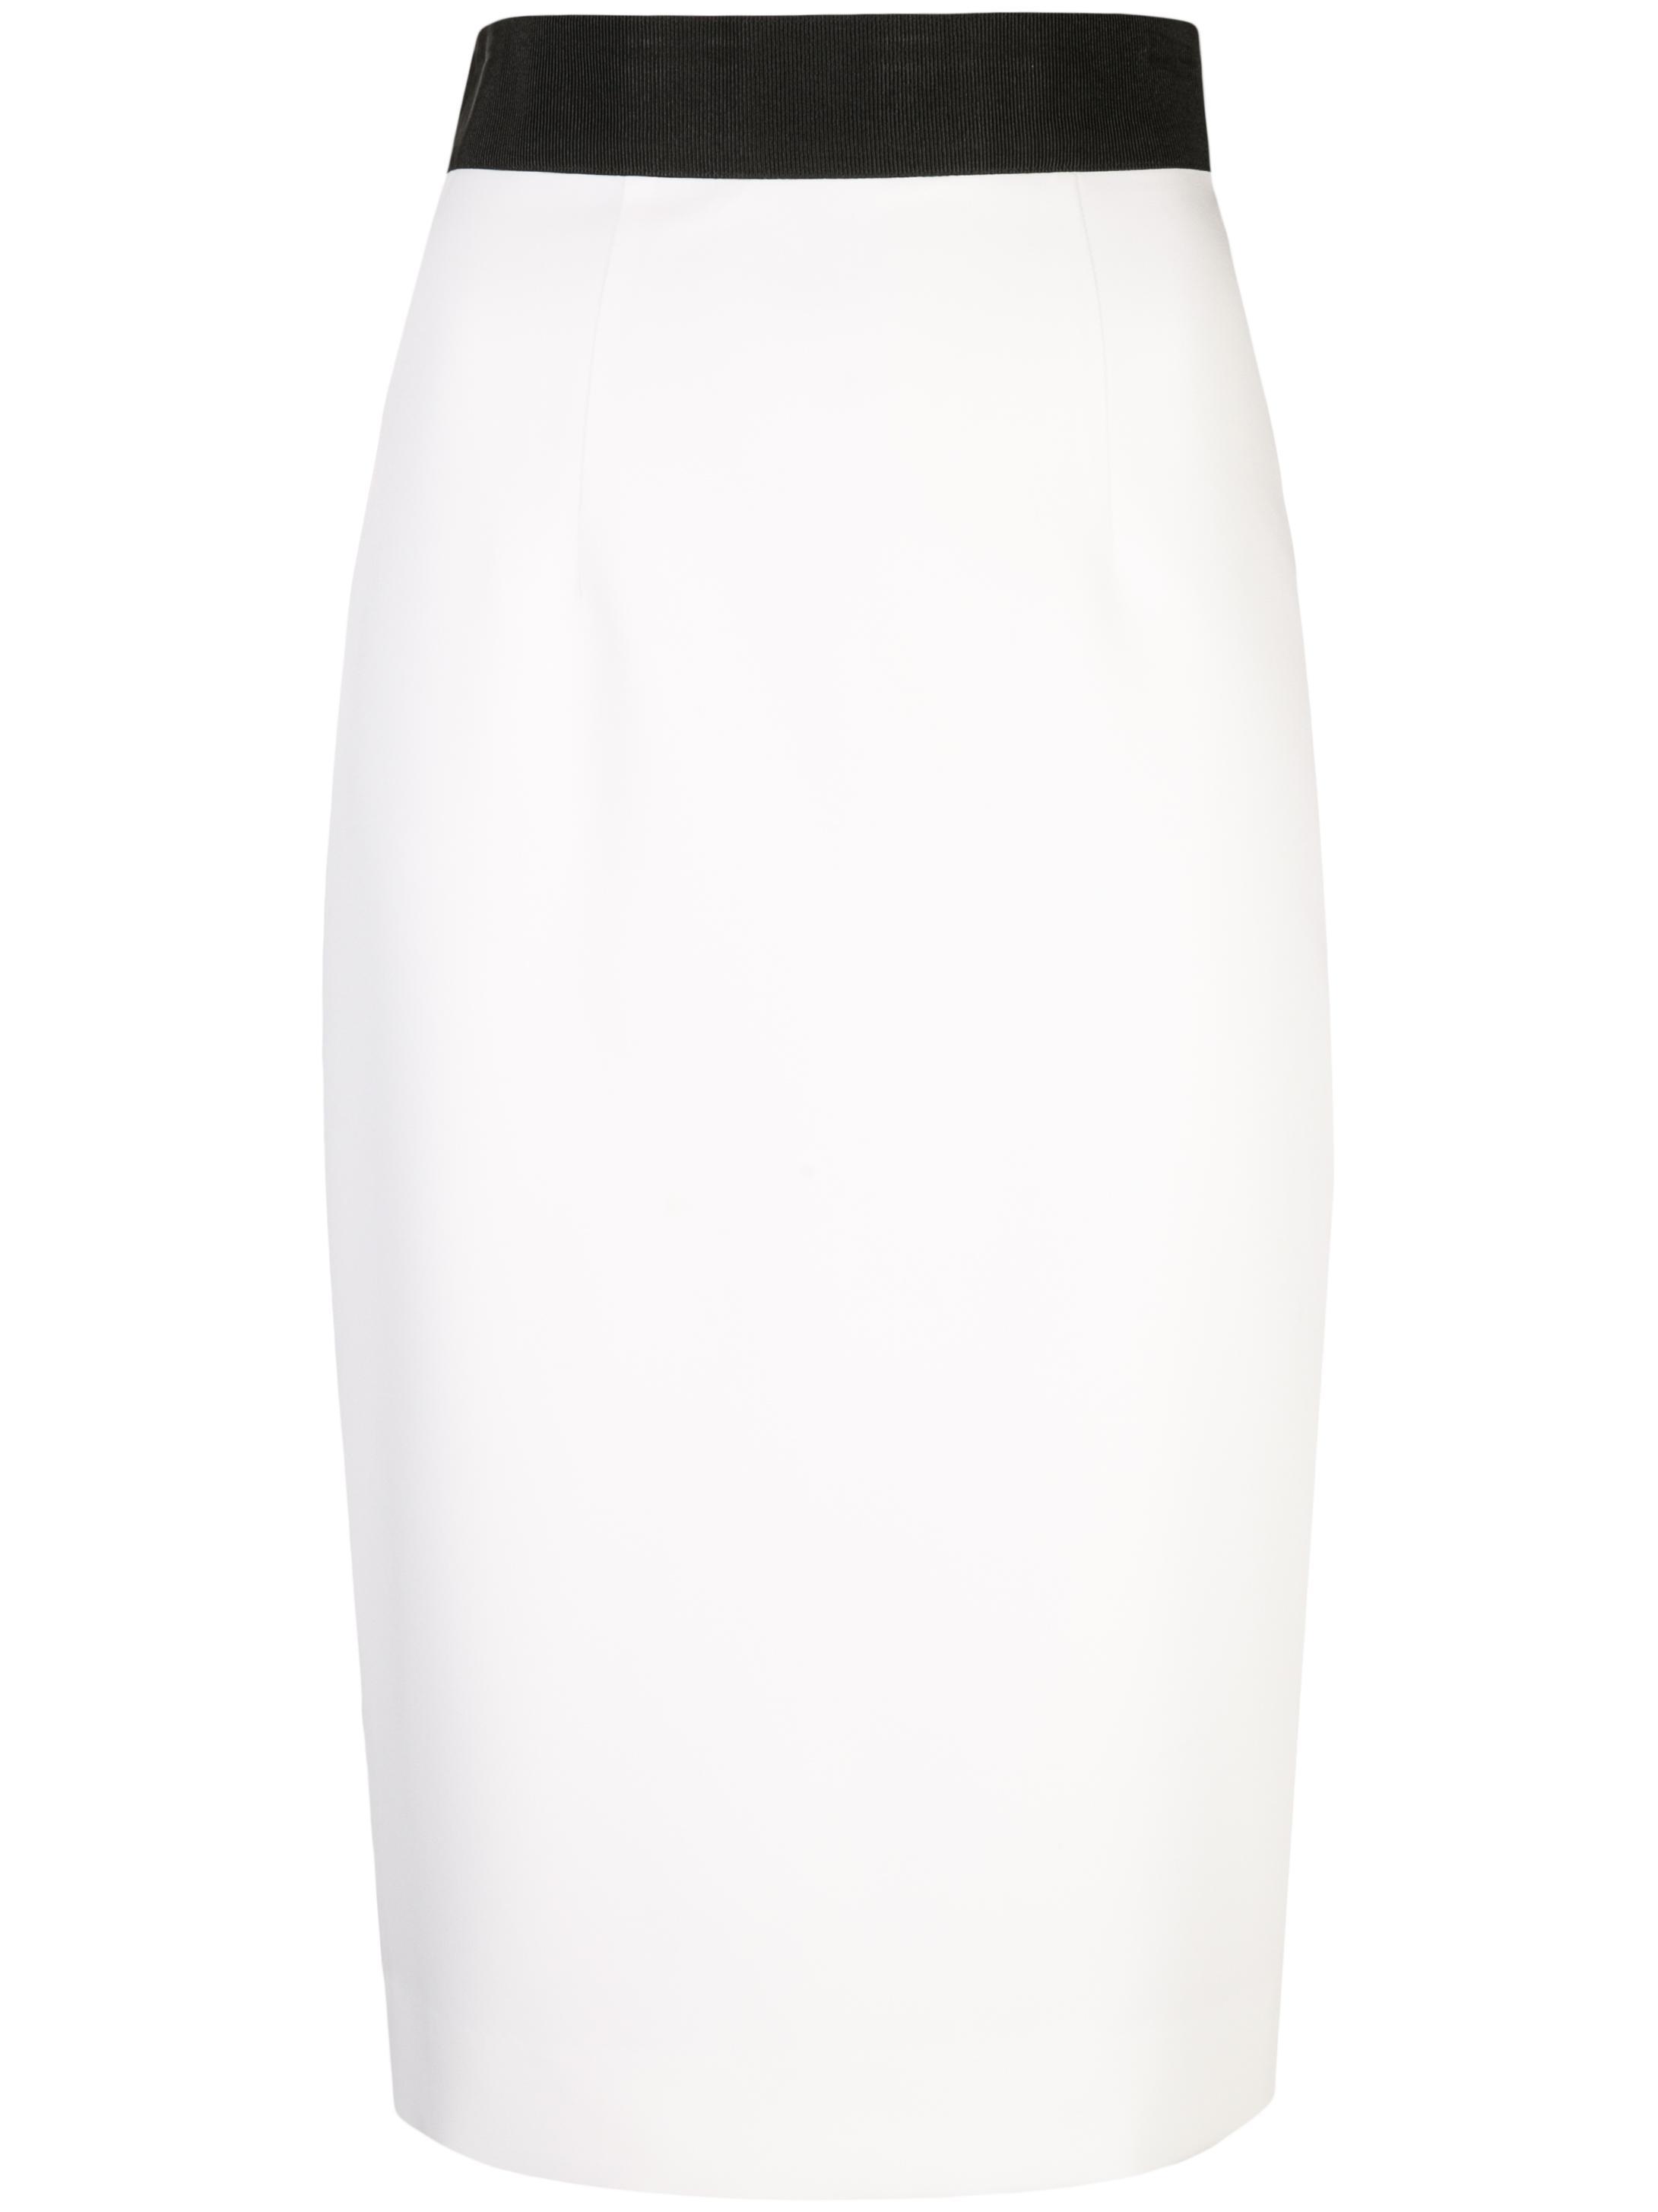 Straight Cady Midi Pencil Skirt Item # 999IC02589-BASIC